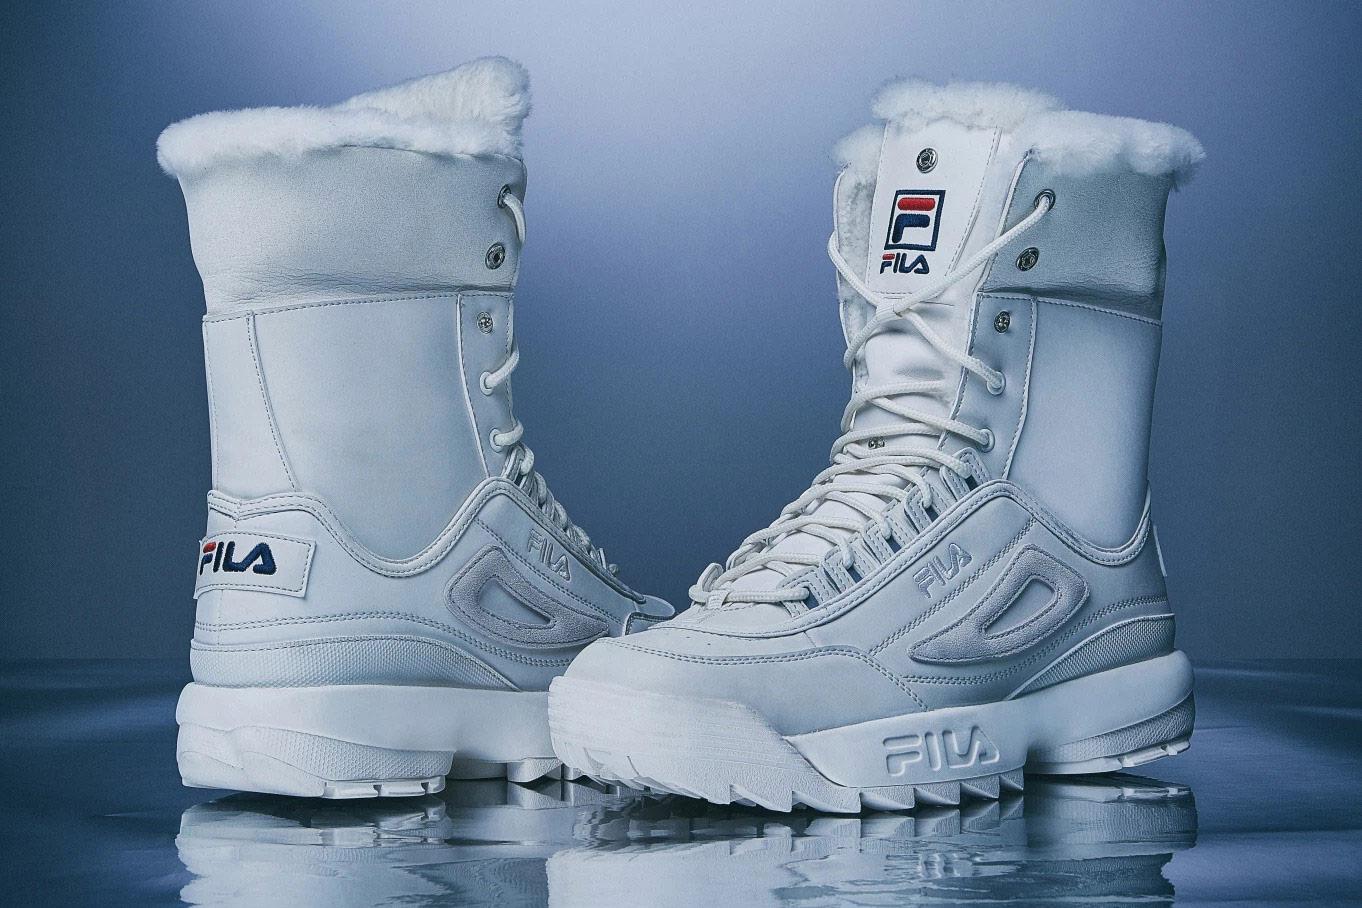 Fila Disruptor 2 Winter Hi-Top Boots — zimní boty — bílé — winter Hi-Top Boots